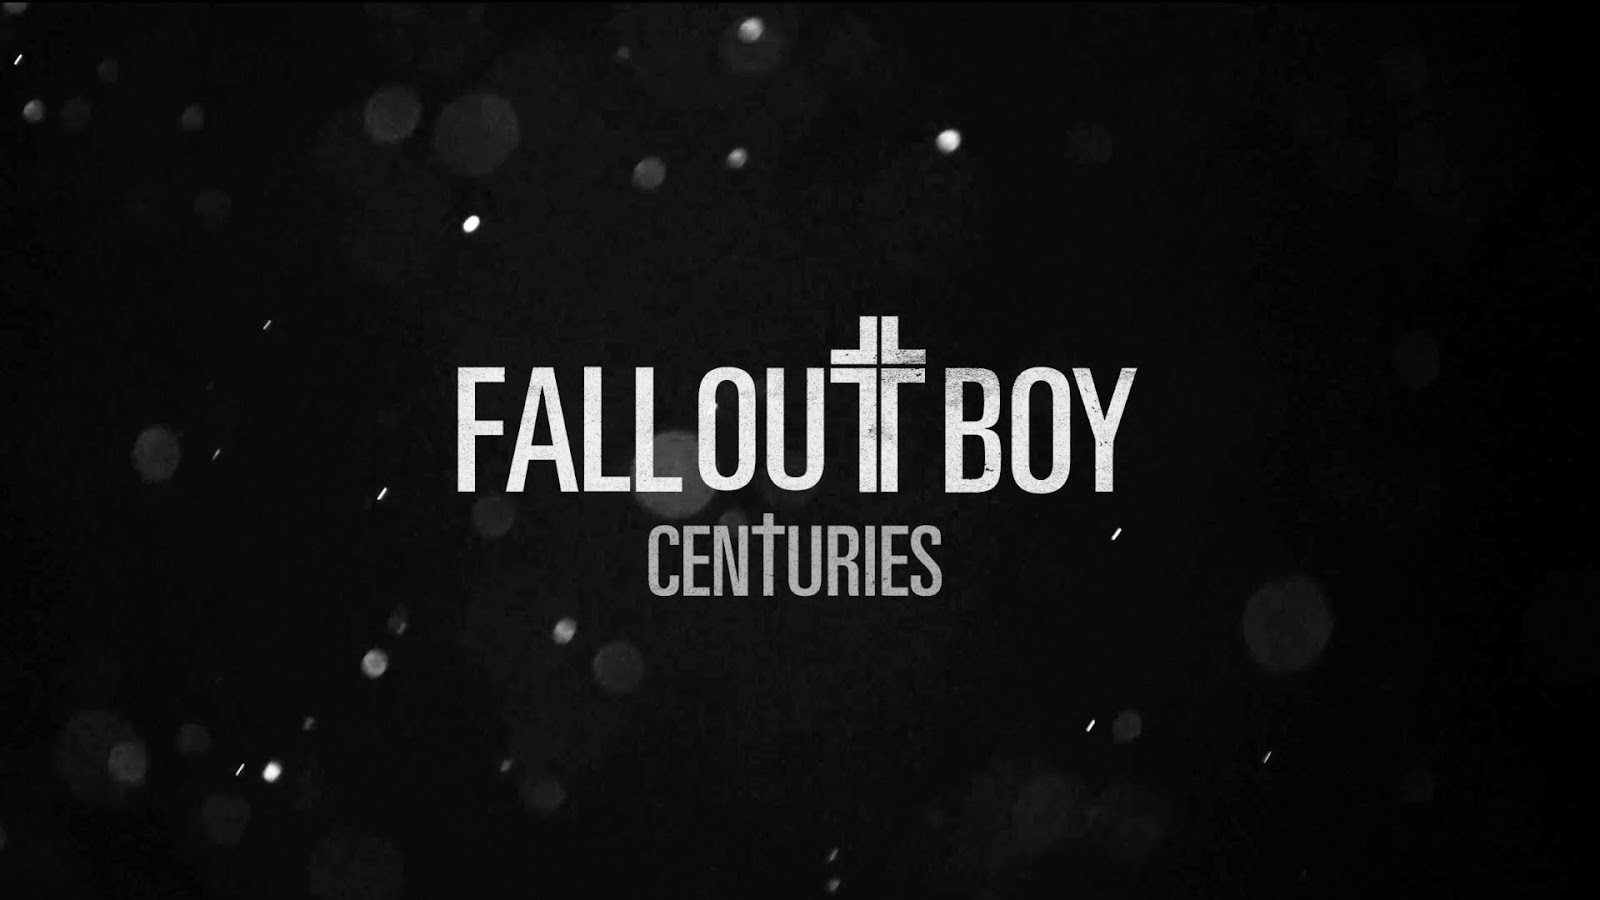 Free Download Fall Out Boy Lyrics Centuries Image Pic Hd Wallpaper